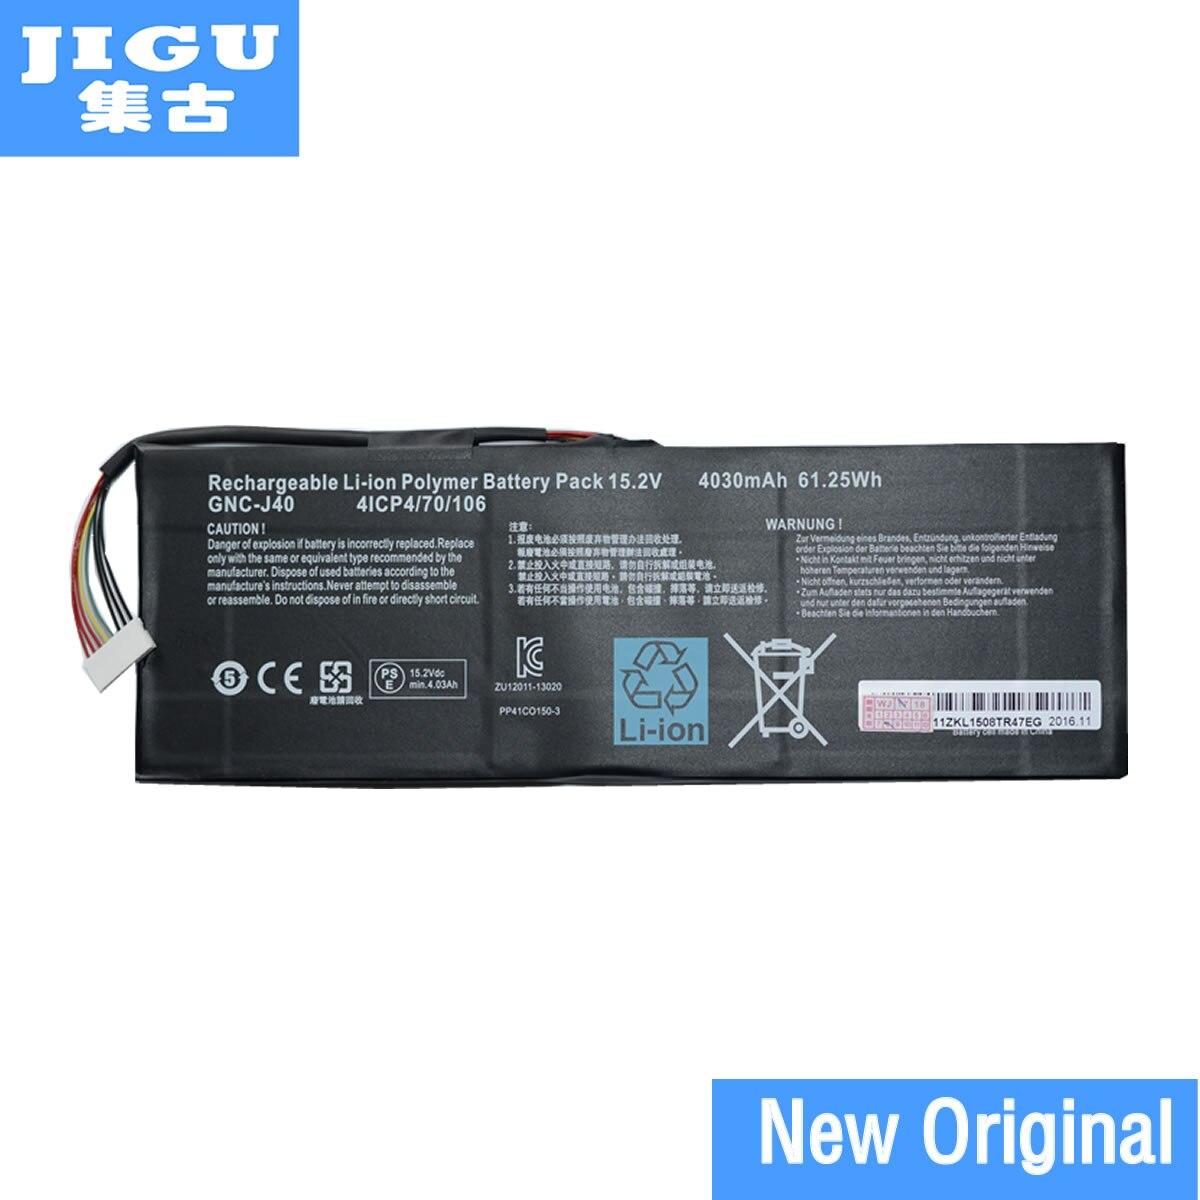 JIGU Original Laptop Battery 916TA013F GNC-J40 For SCHENKER XMG C504 FOR GIGABYTE P34 V4 P34G V2 P34W V3 V4 цены онлайн